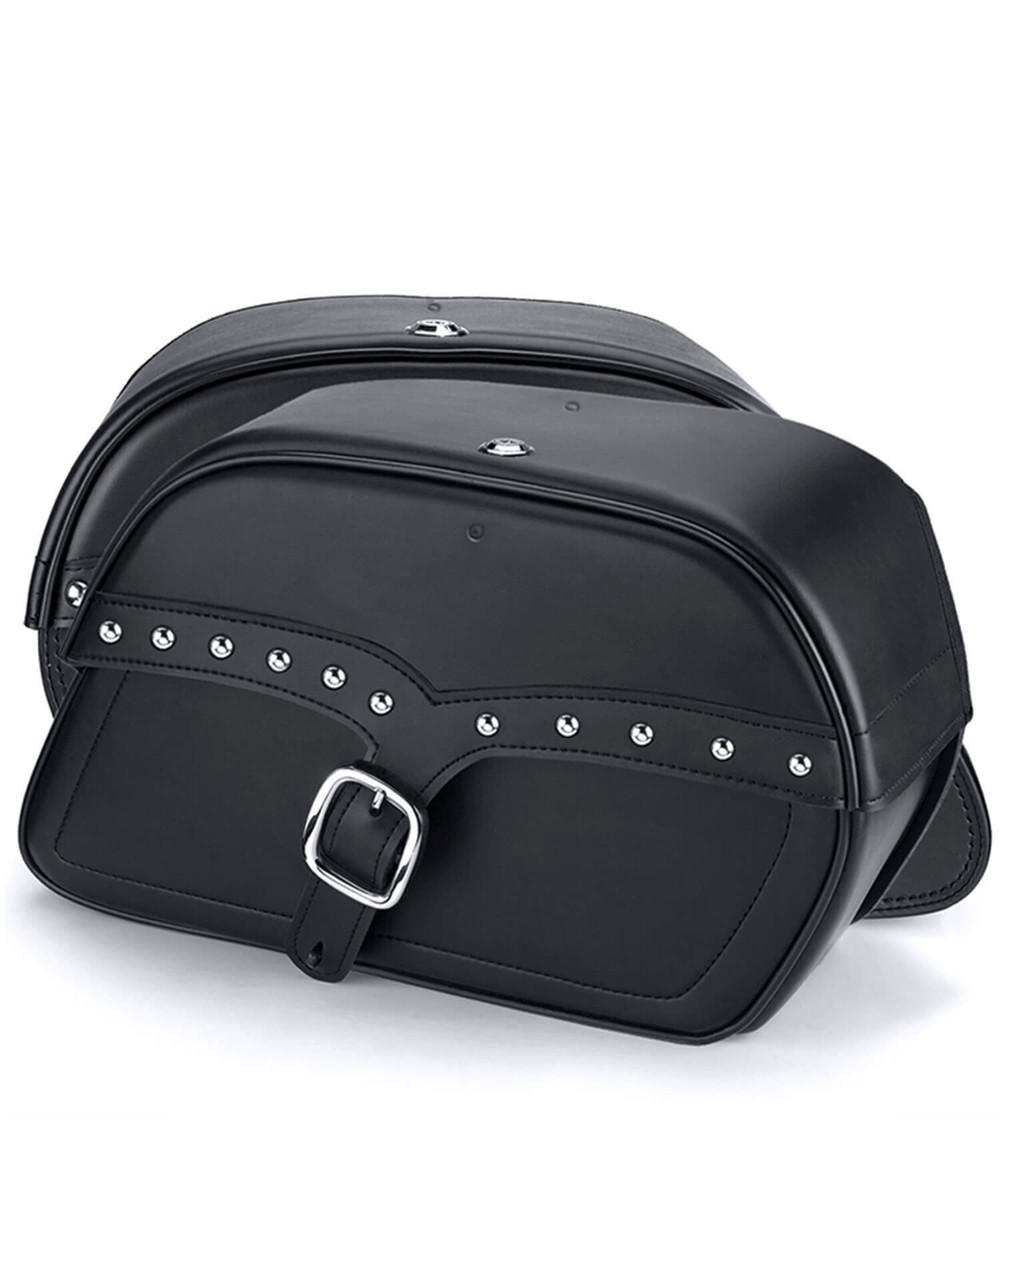 Yamaha V Star 650 Classic Medium Charger Single Strap Studded Motorcycle Saddlebags Both Bags View